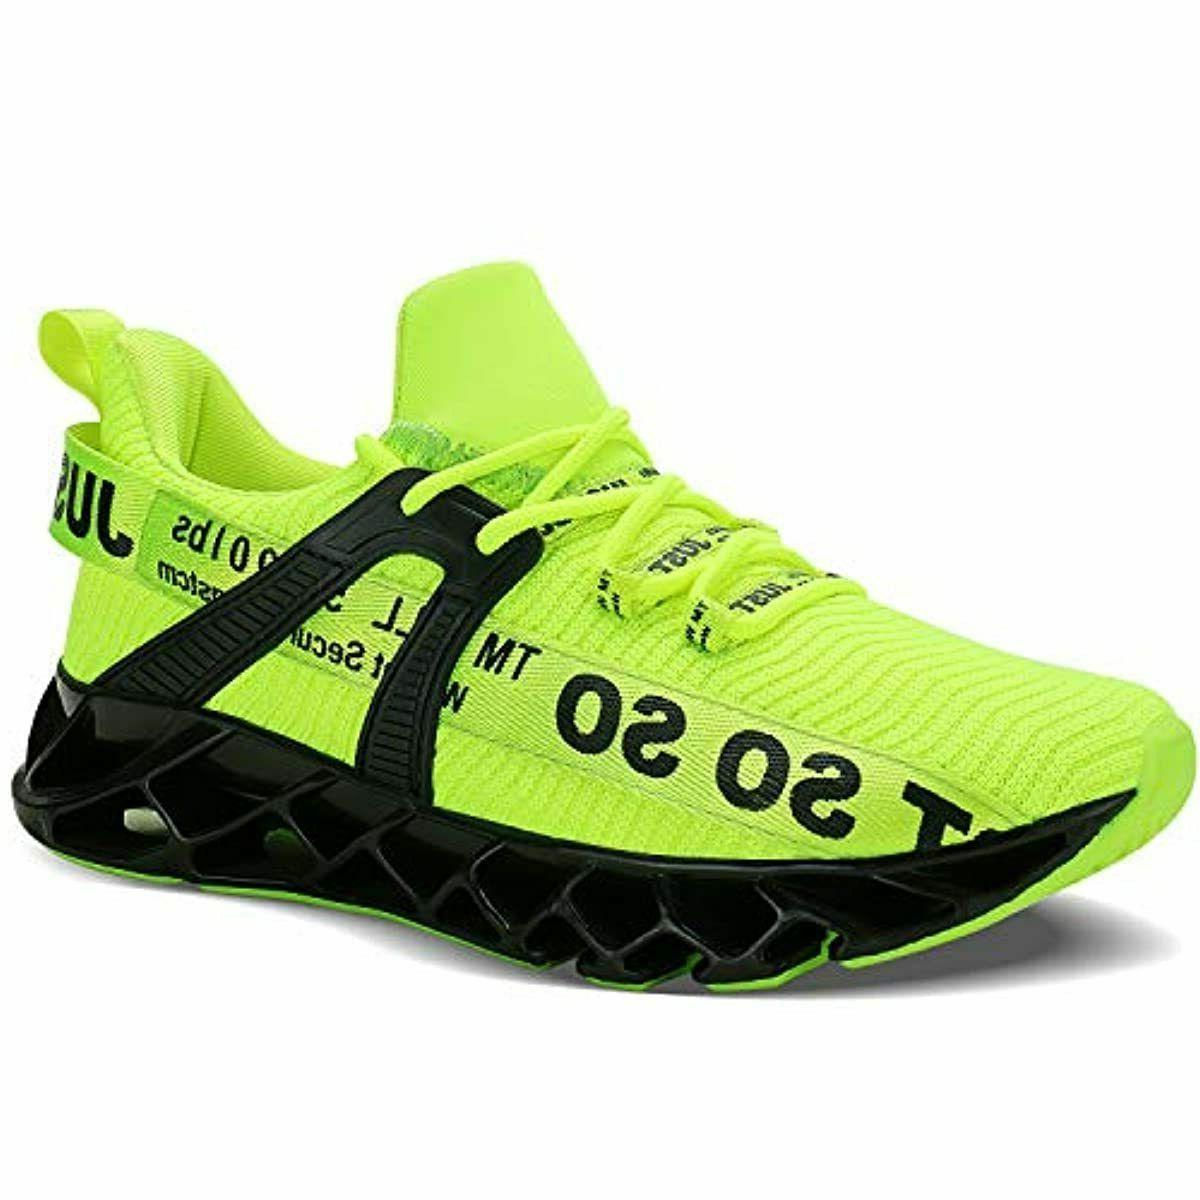 UMYOGO Mens Blade Running Tennis Fashion Sneakers